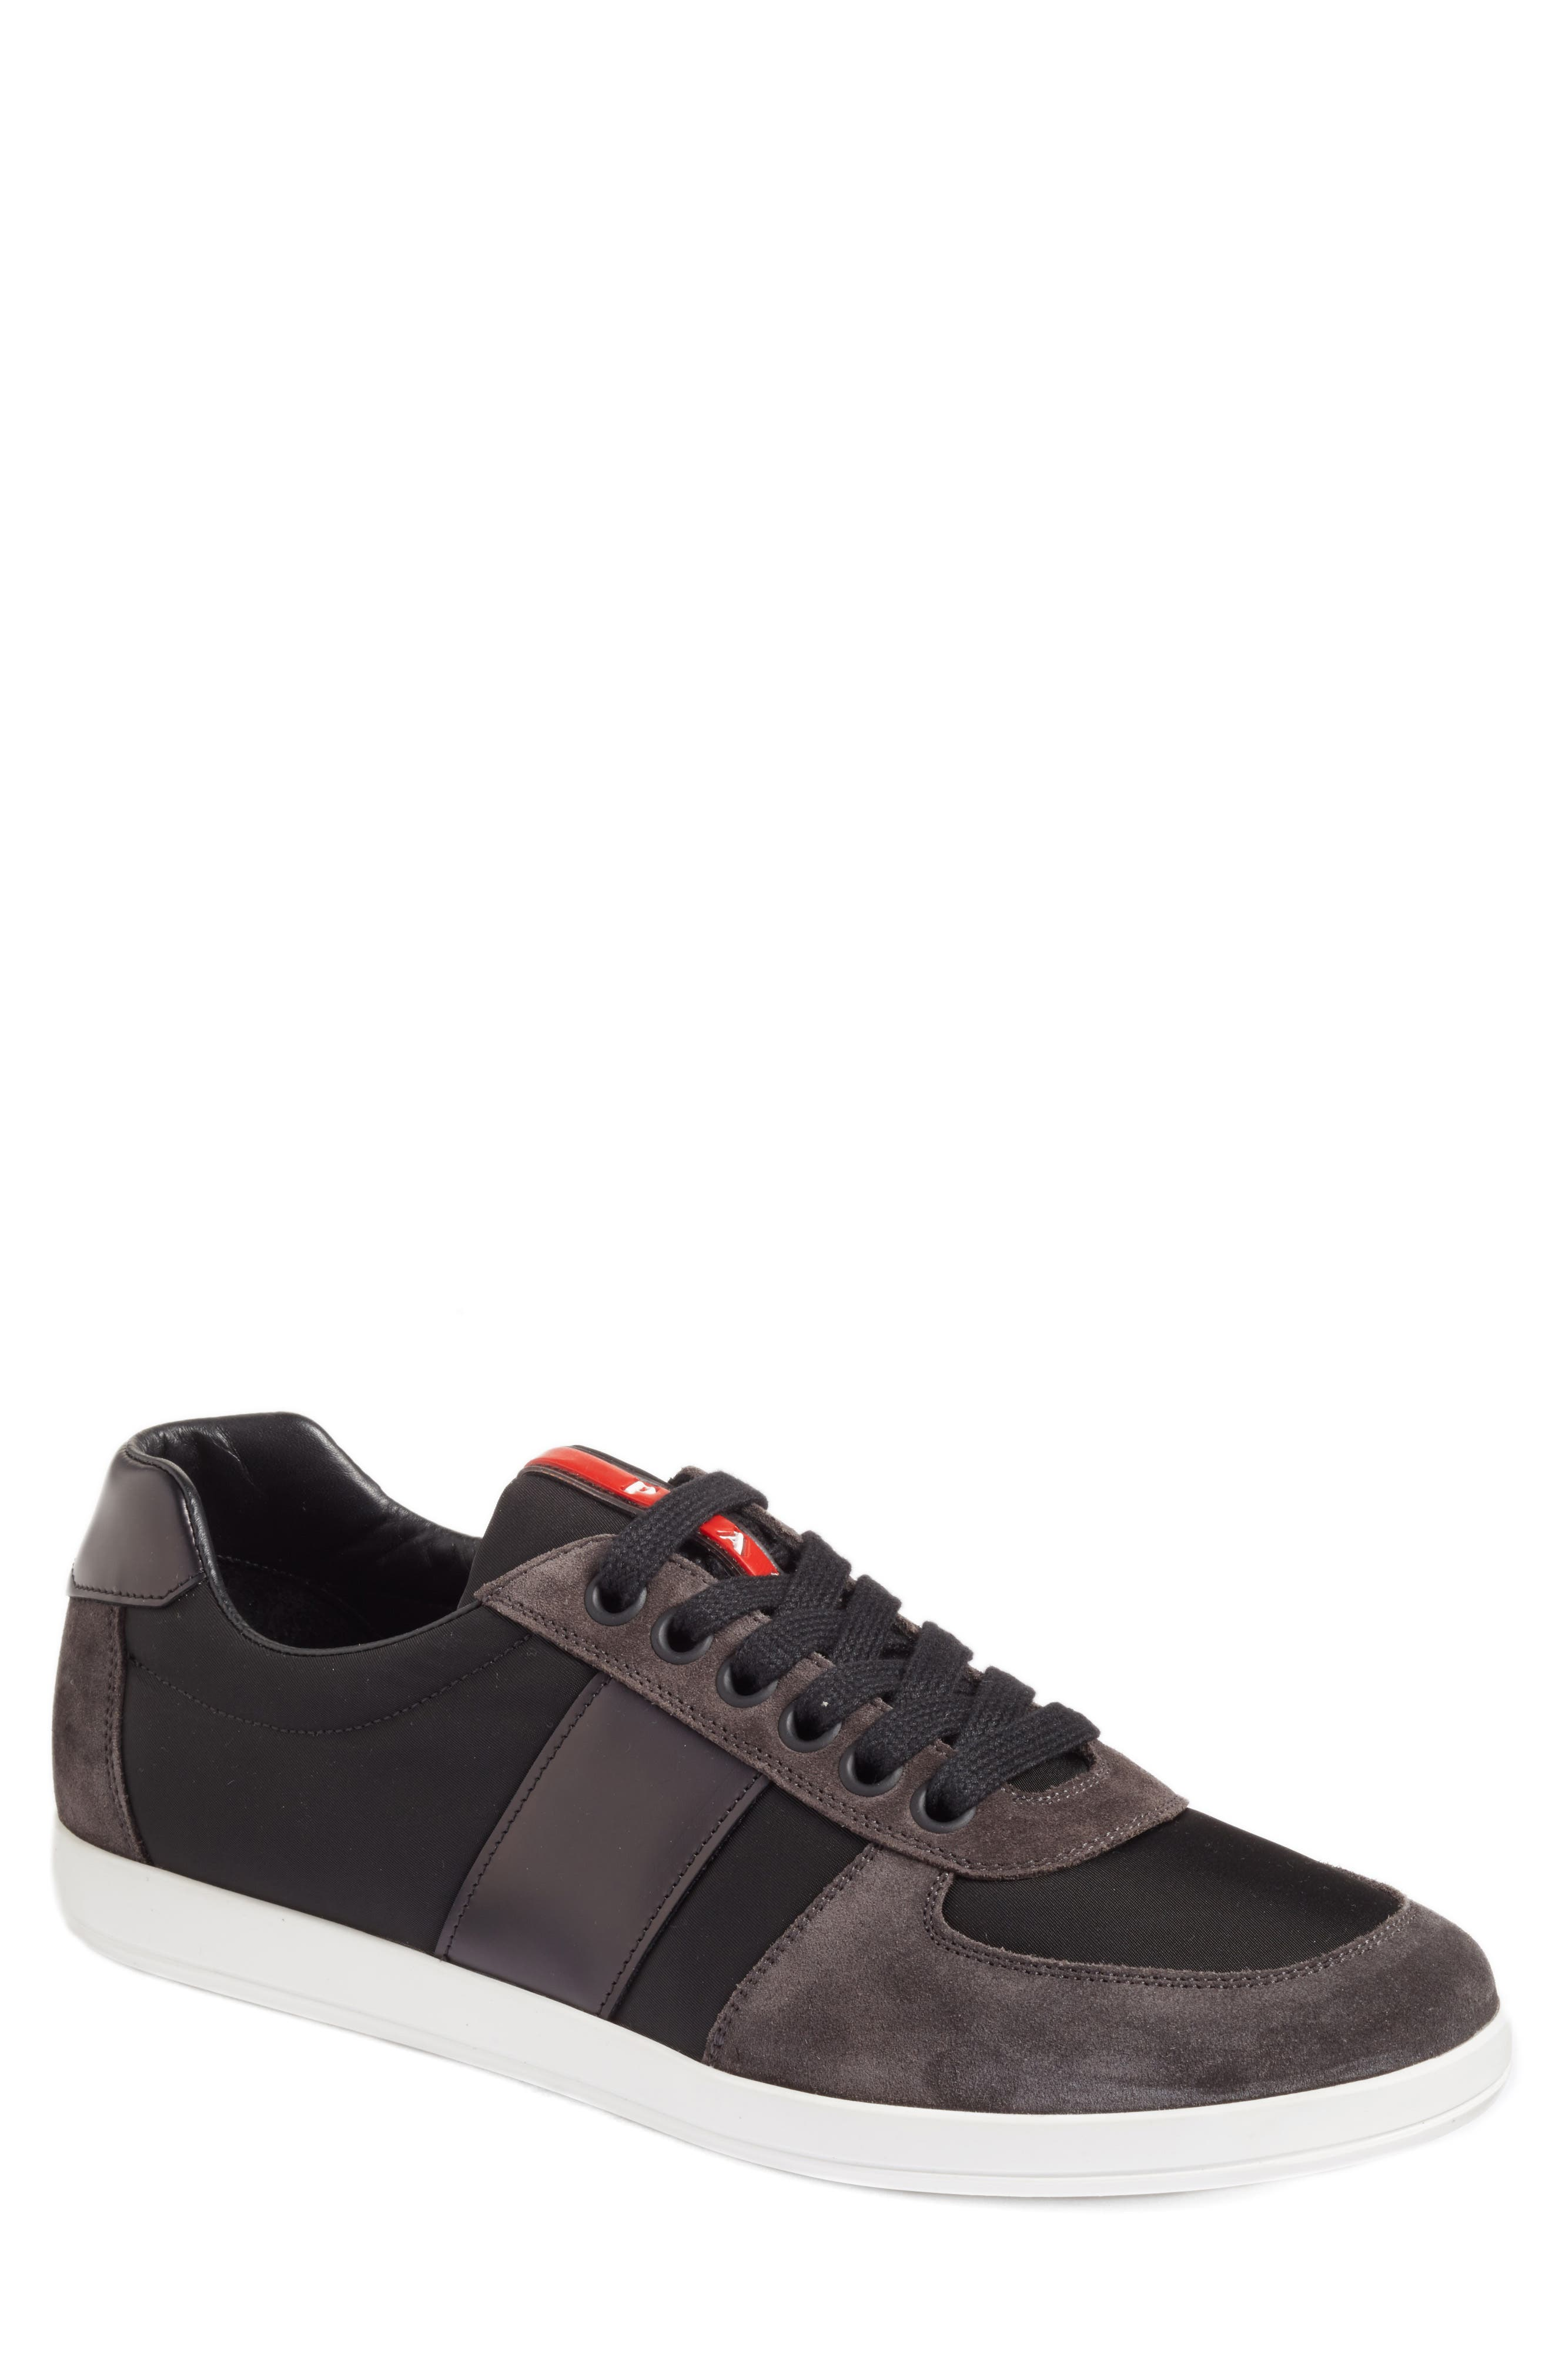 Linea Rossa Sneaker,                             Main thumbnail 1, color,                             010